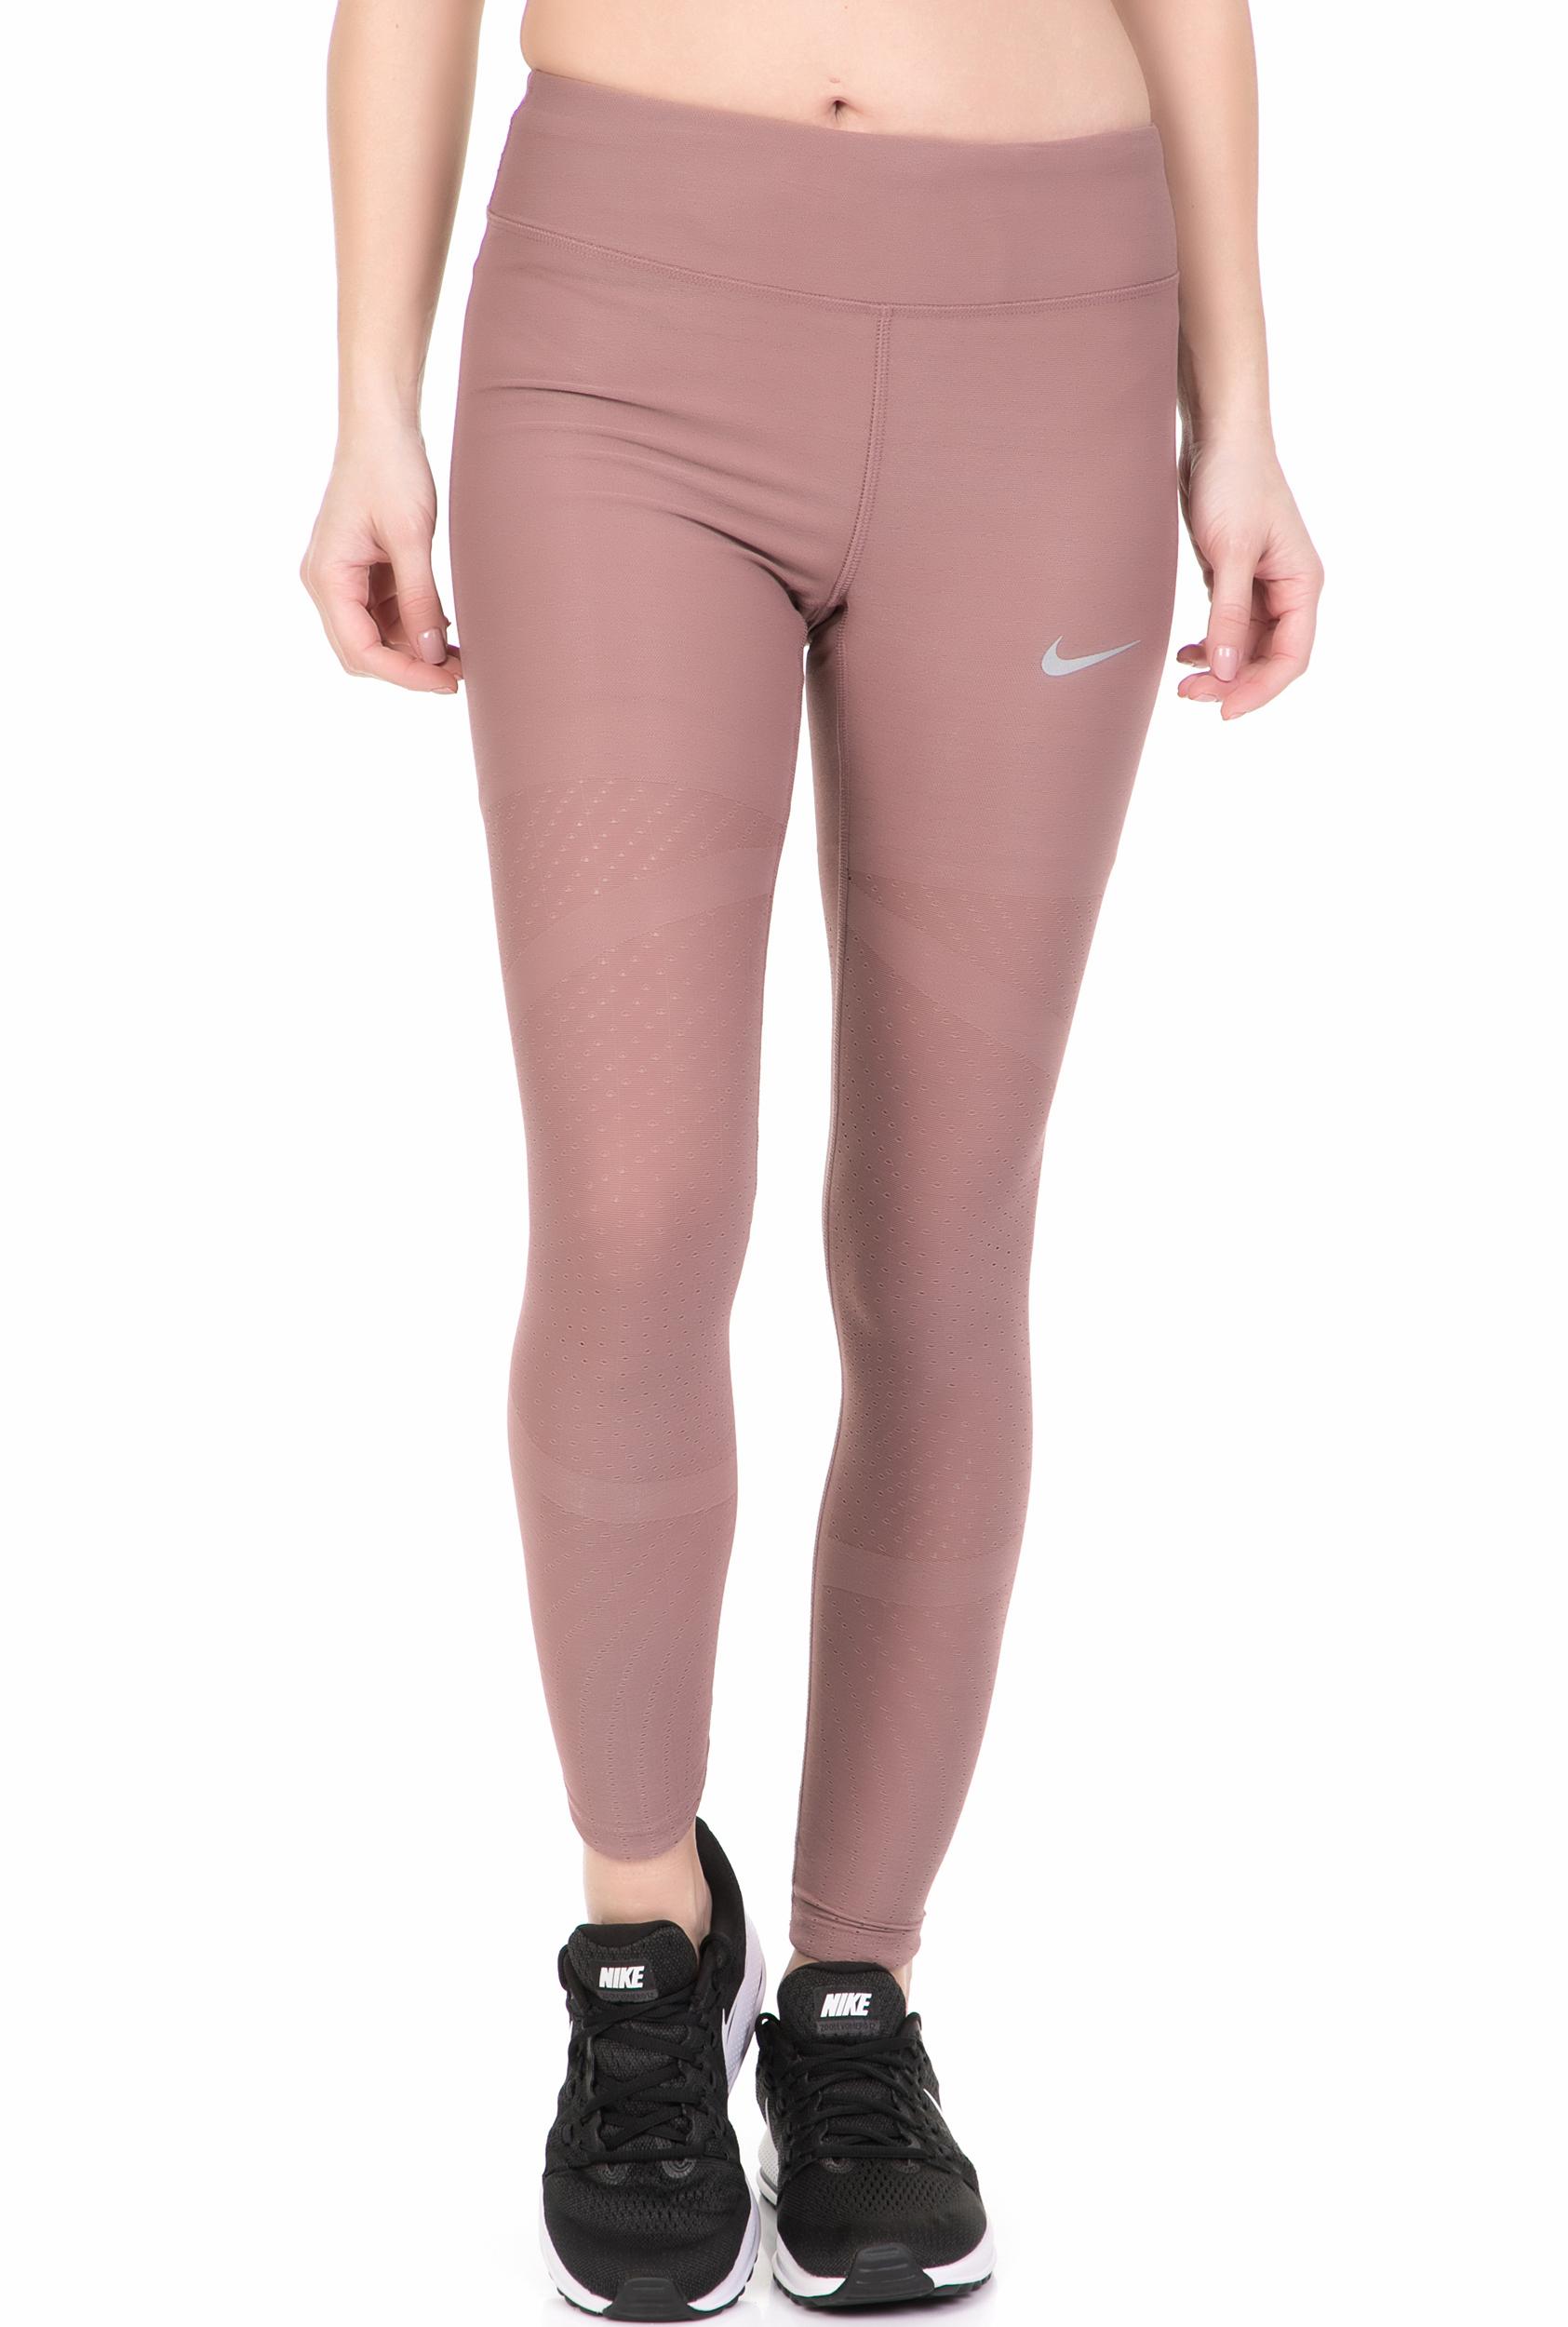 e51e4610776 NIKE - Γυναικείο κολάν για τρέξιμο Nike Epic Lux Athena ροζ